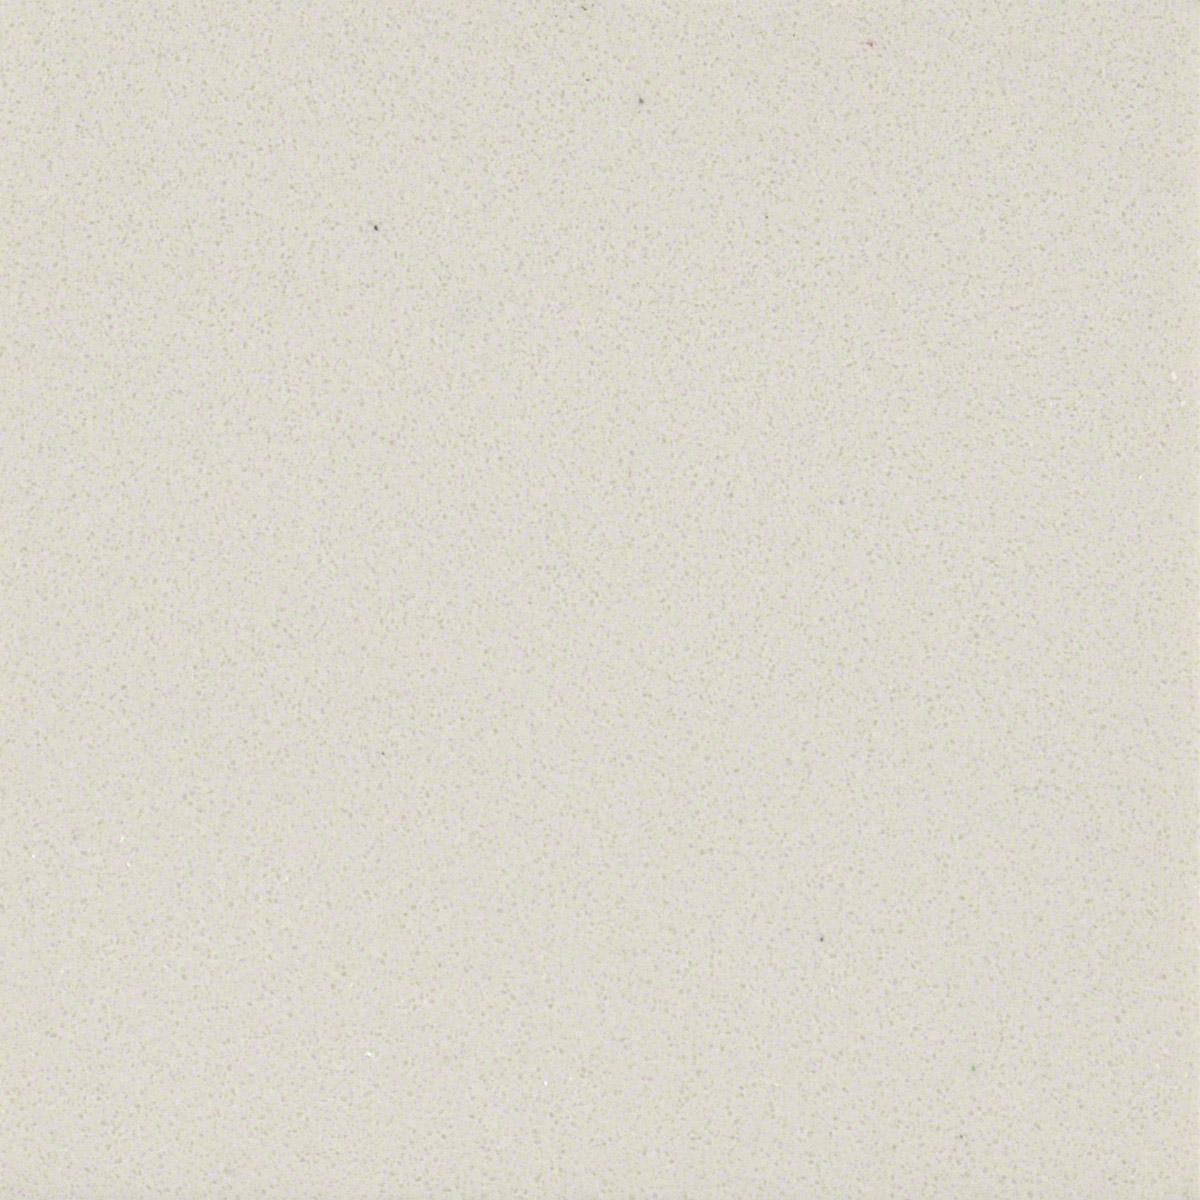 Polar White Engineered Marble